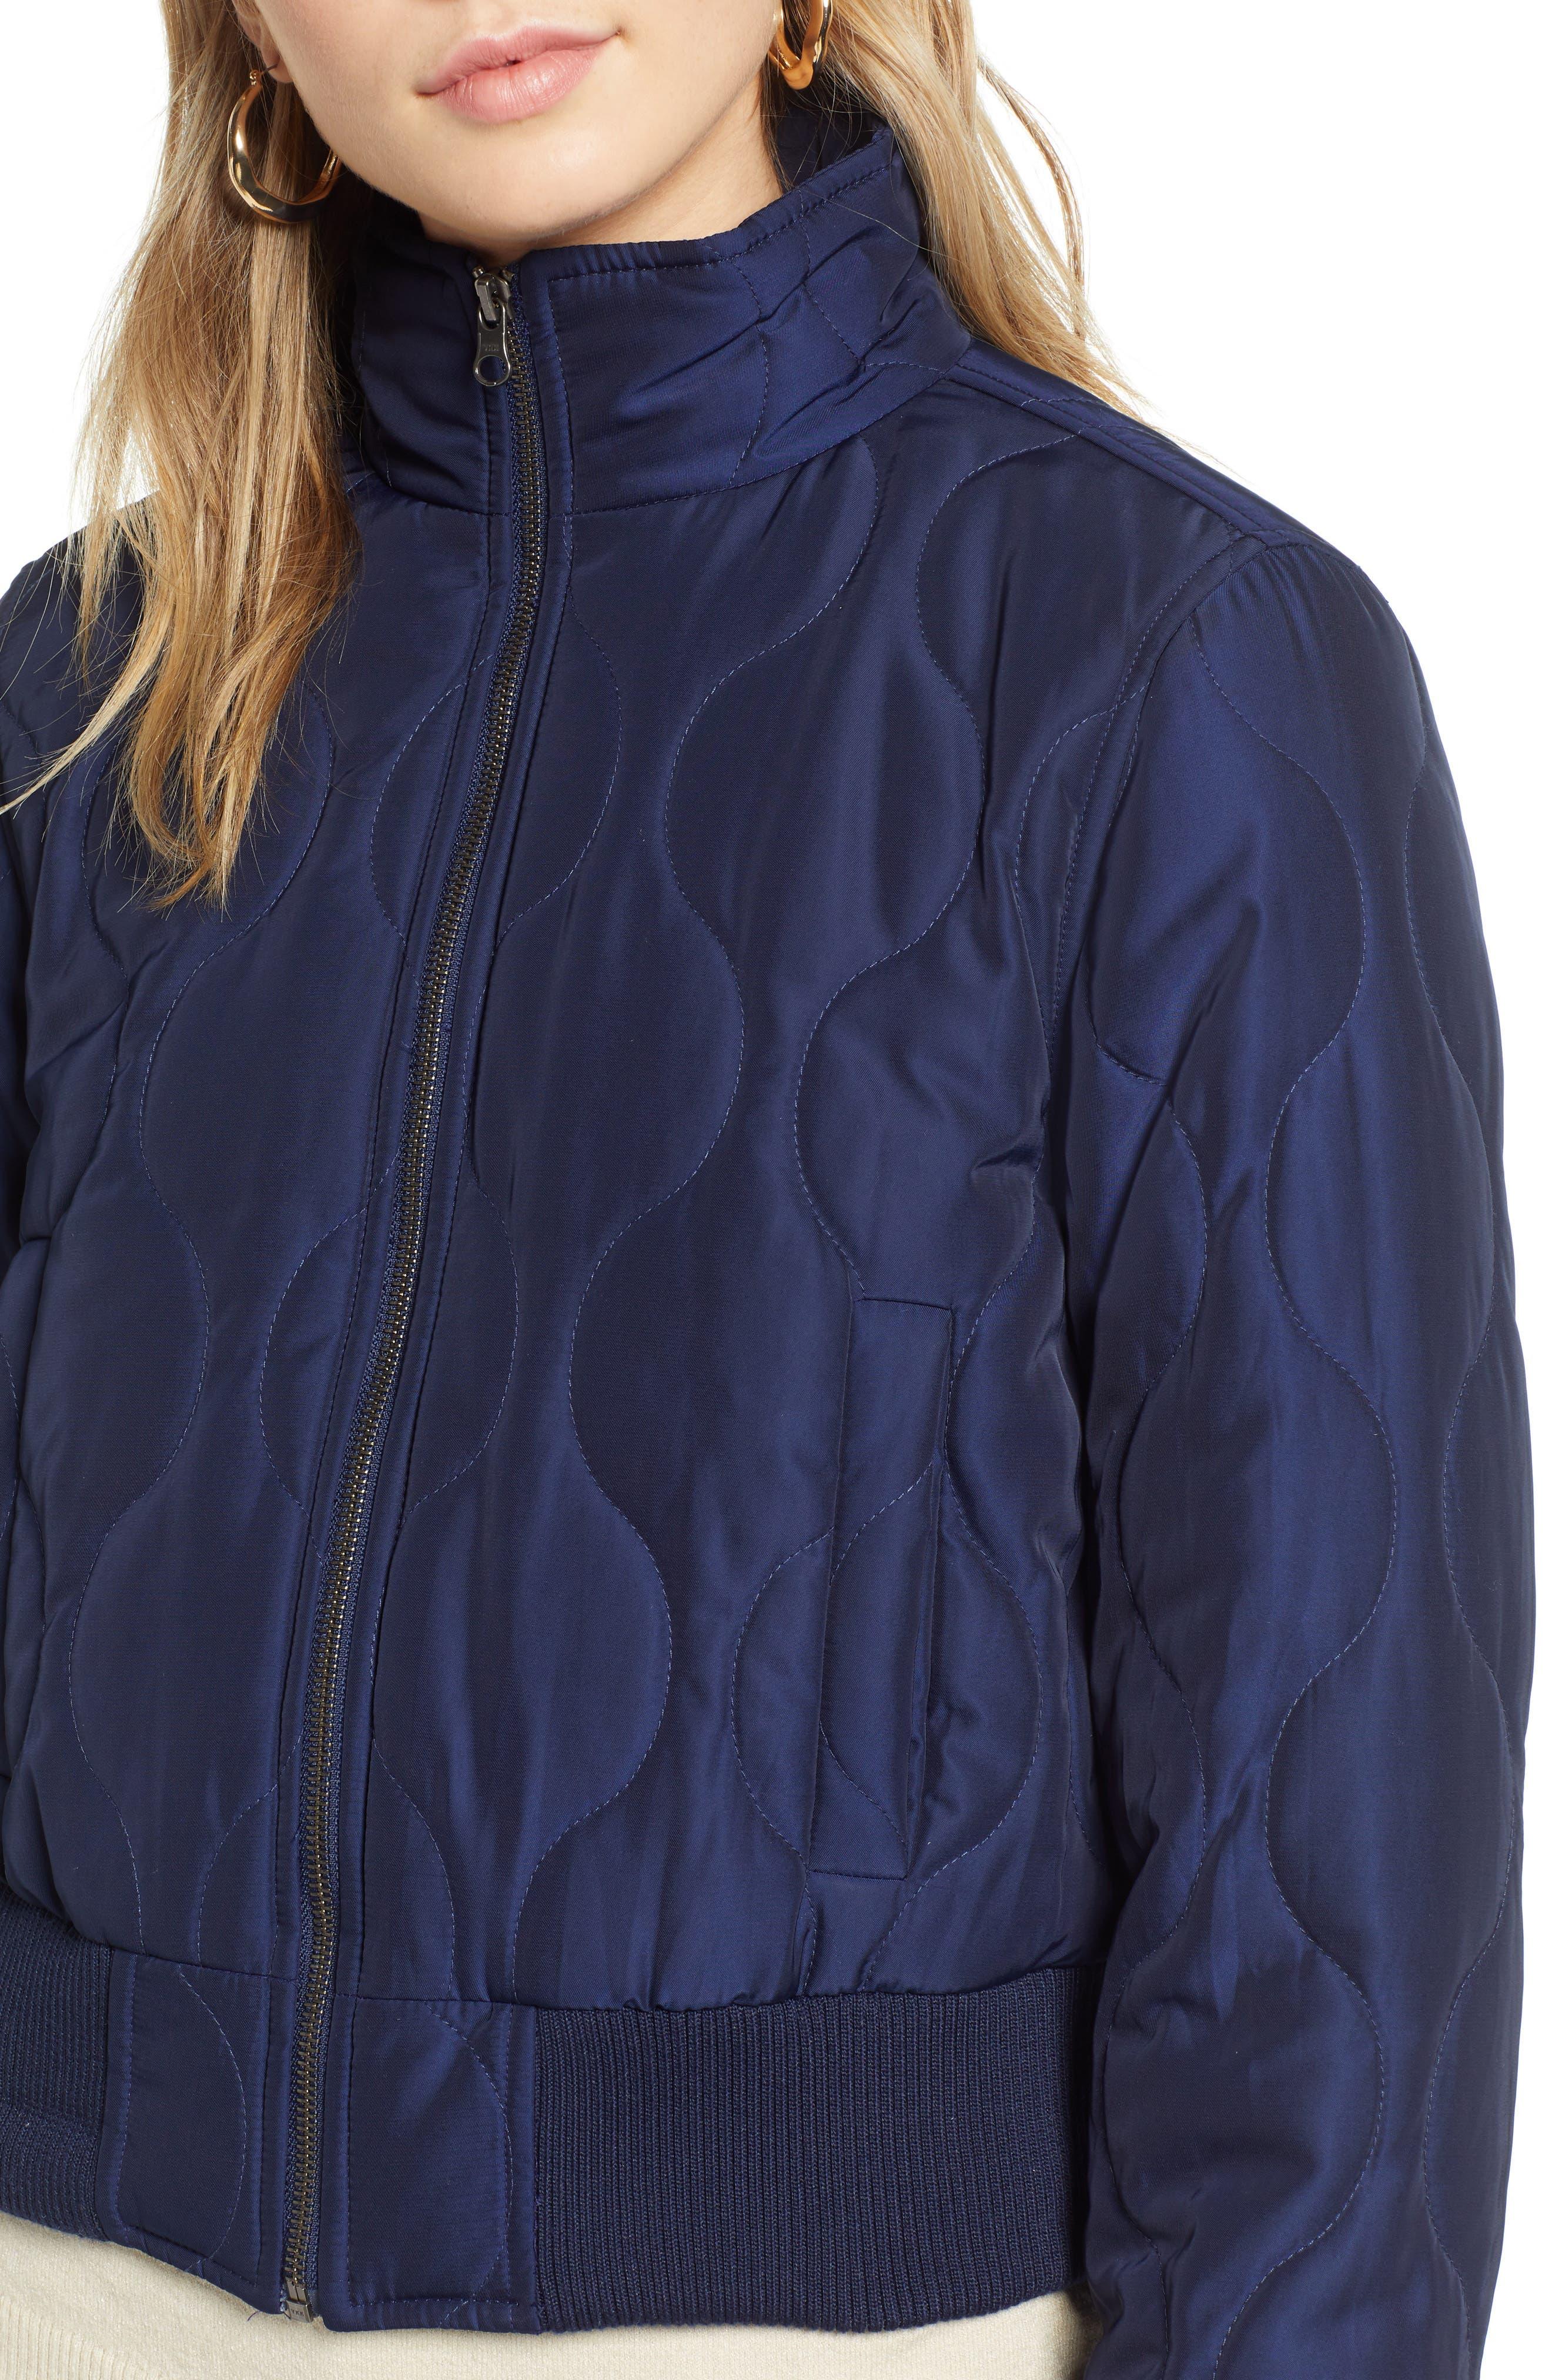 TREASURE & BOND, Satin Crop Puffer Jacket, Alternate thumbnail 5, color, NAVY MARITIME